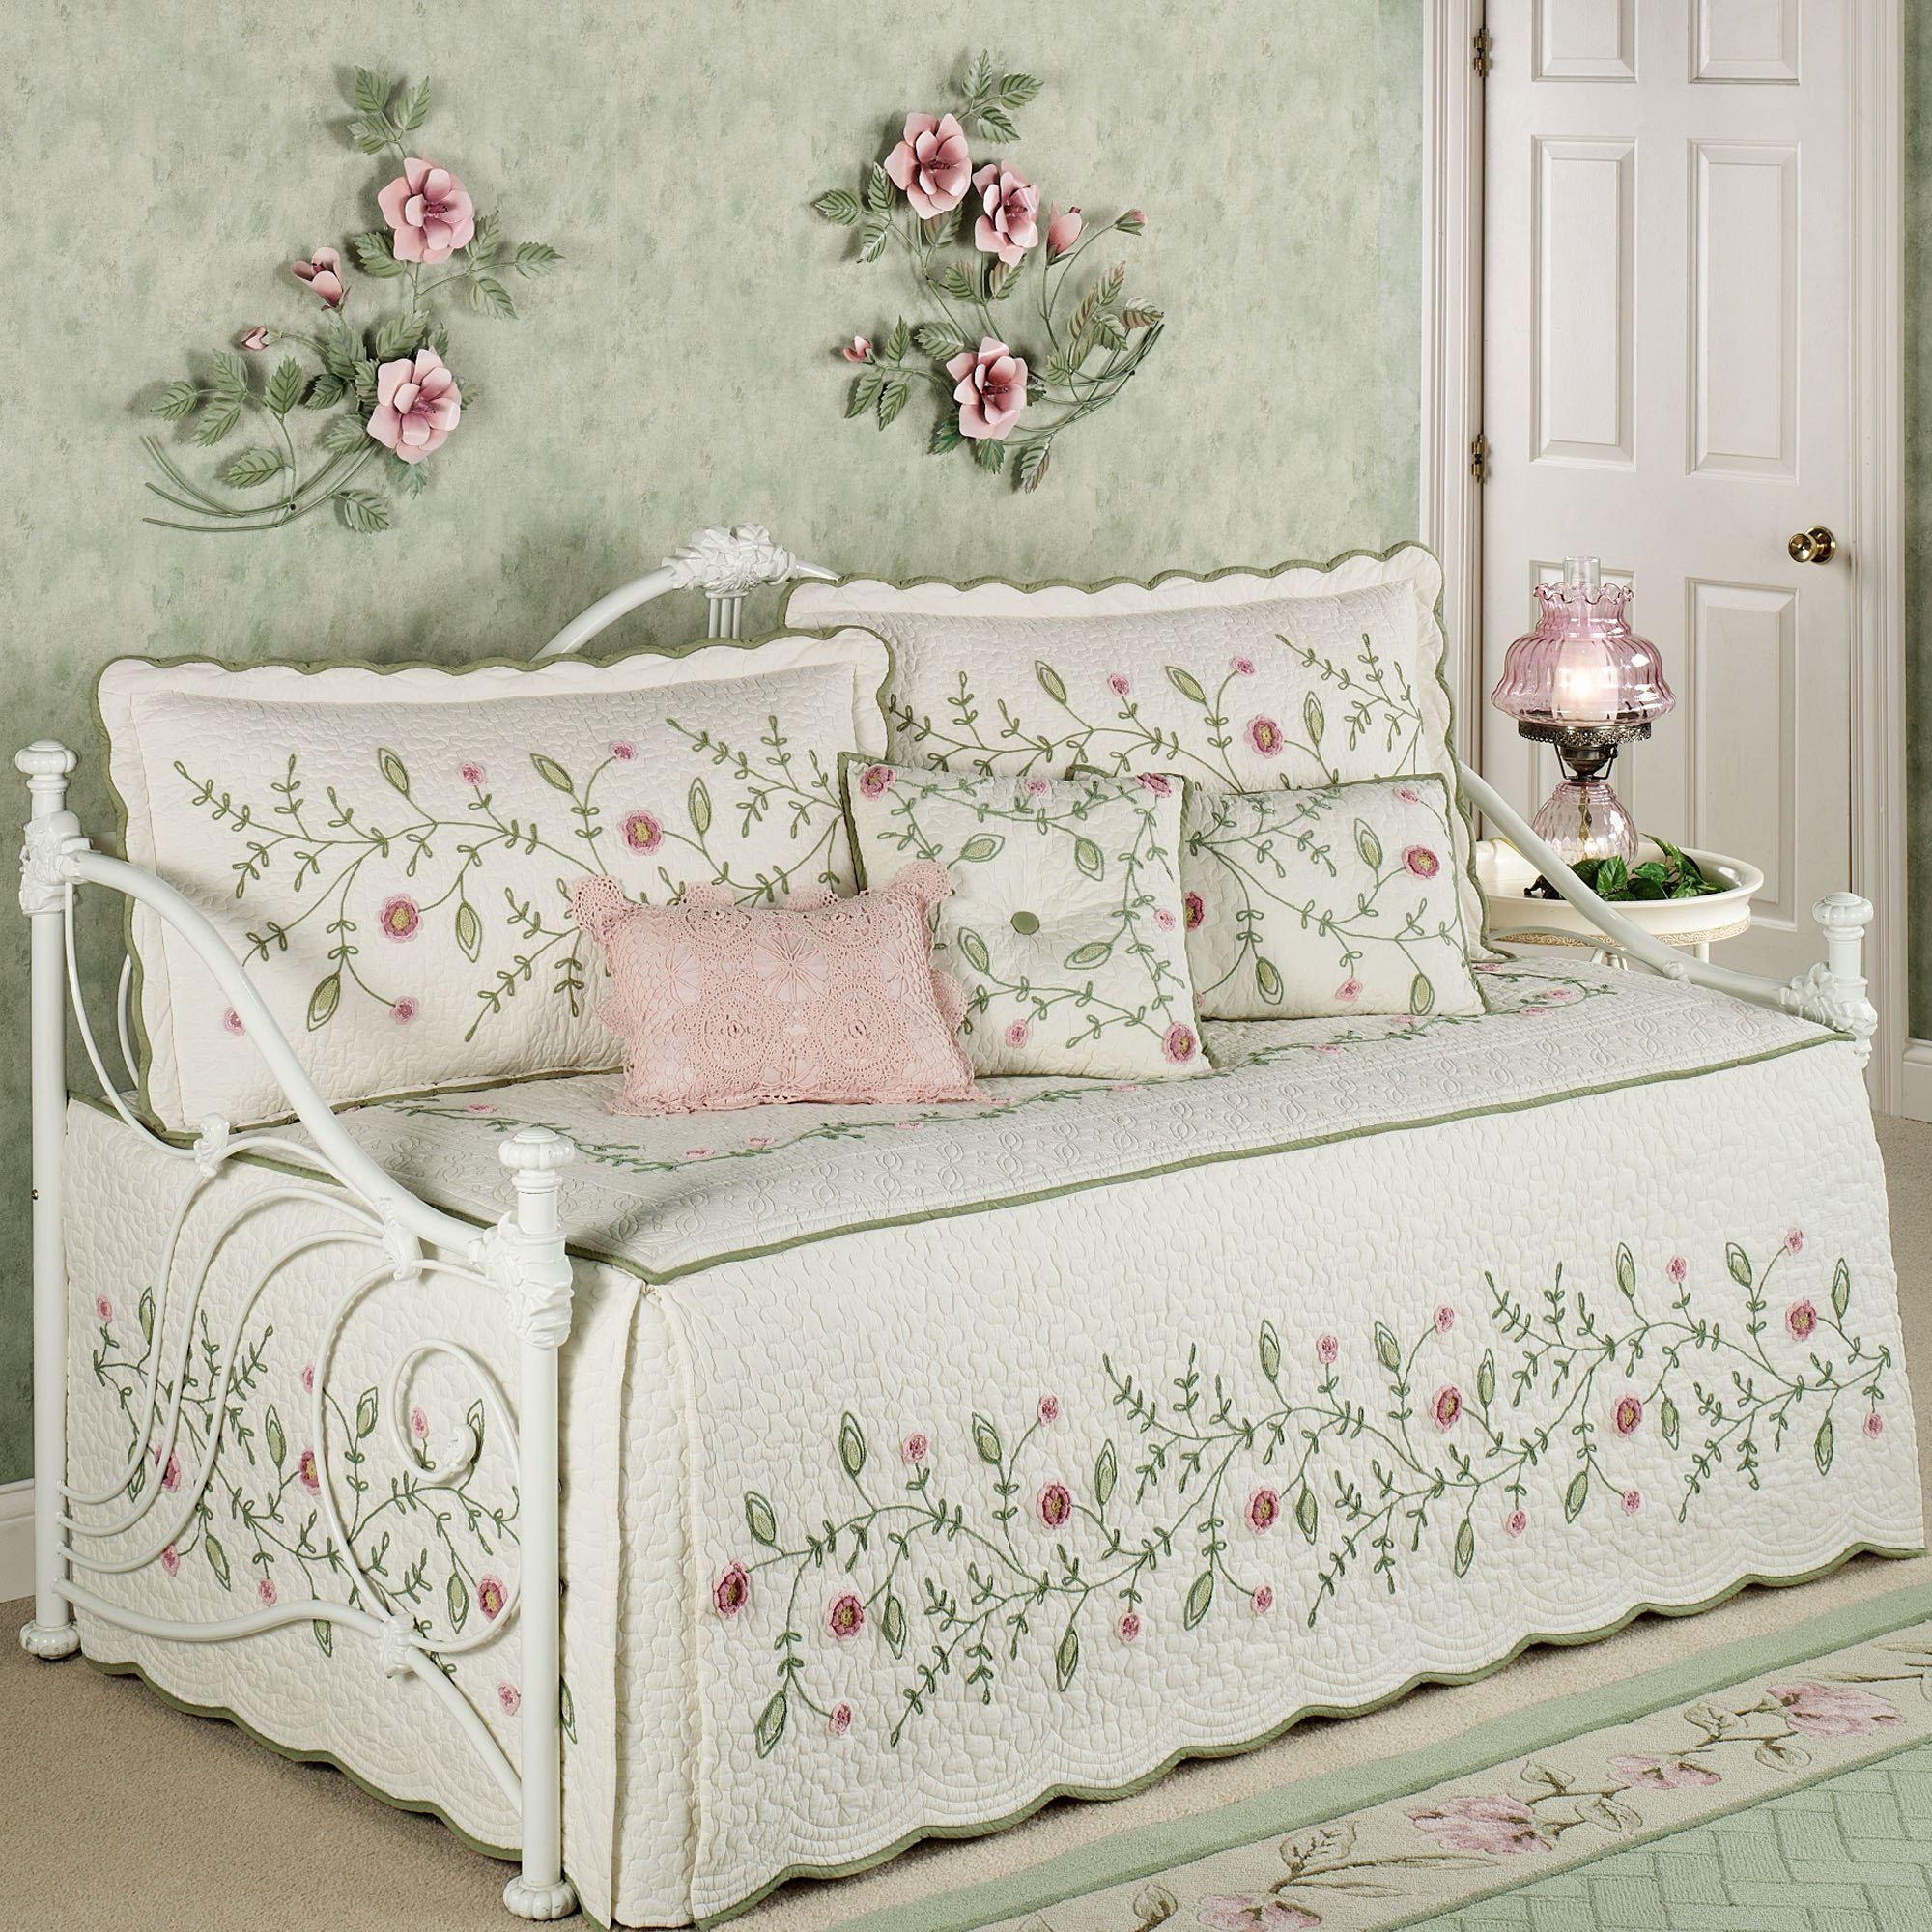 Overawe Daybed Bedding Set Design Ideas | Daybeds | Pinterest ... : day bed quilt sets - Adamdwight.com